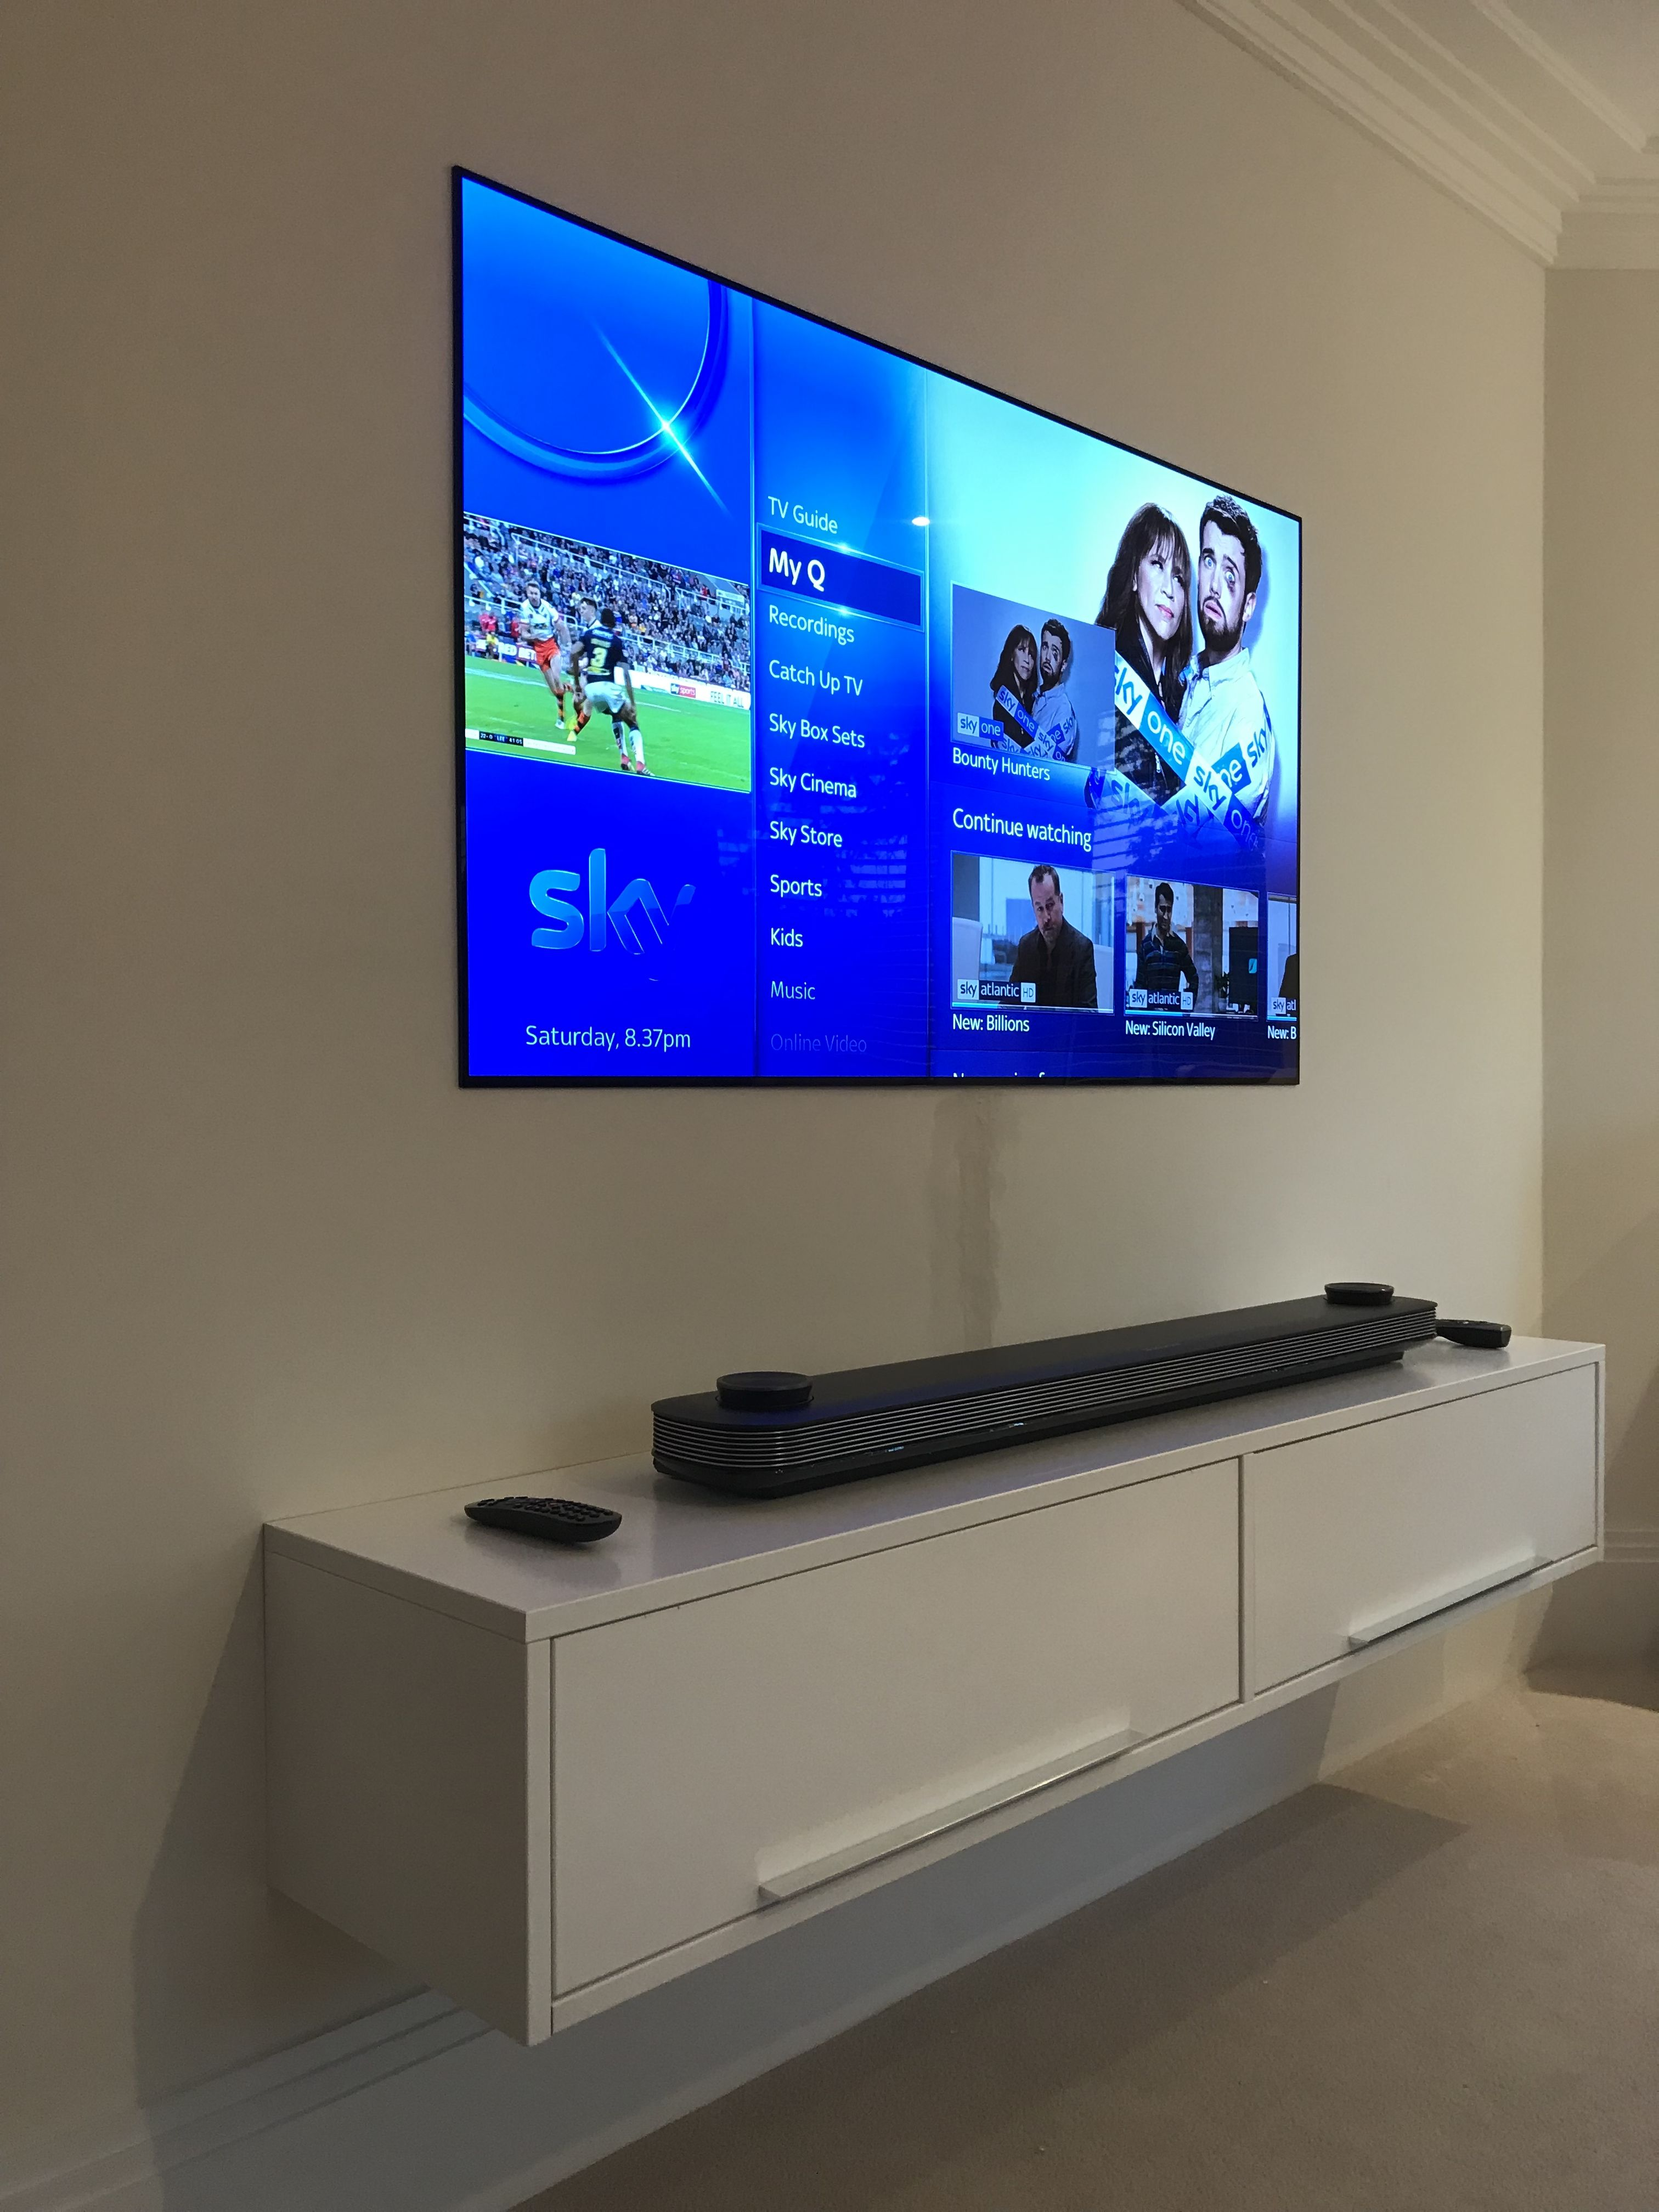 65 Lg Signature 4k Wallpaper Tv Tv In Bedroom Wall Mounted Tv Design Studio Office